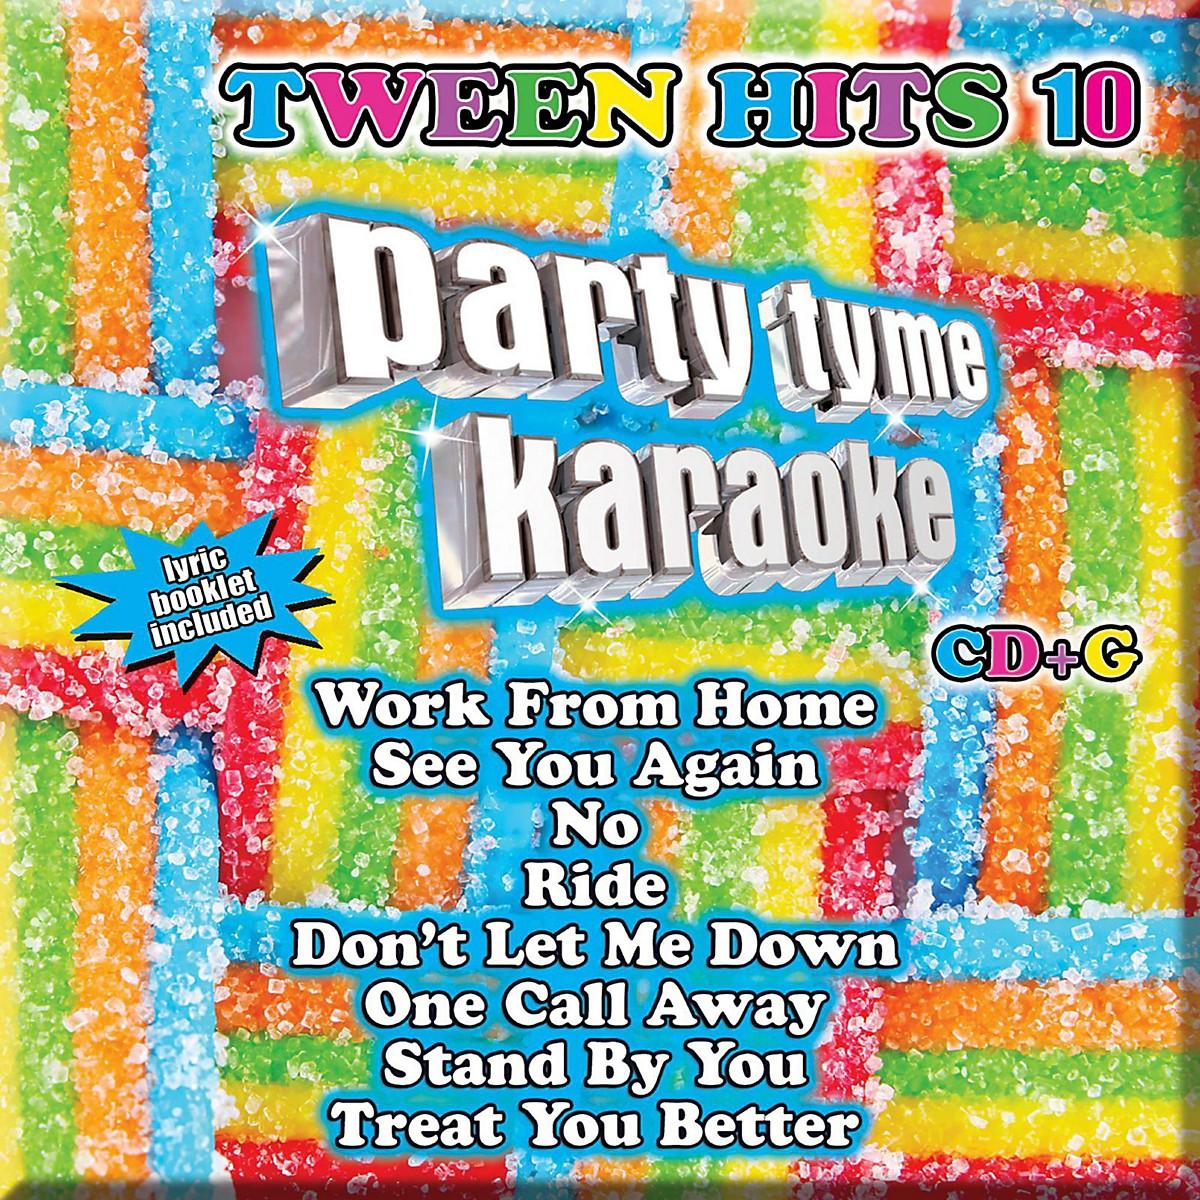 Universal Music Group Party Tyme Karaoke - Tween Hits 10